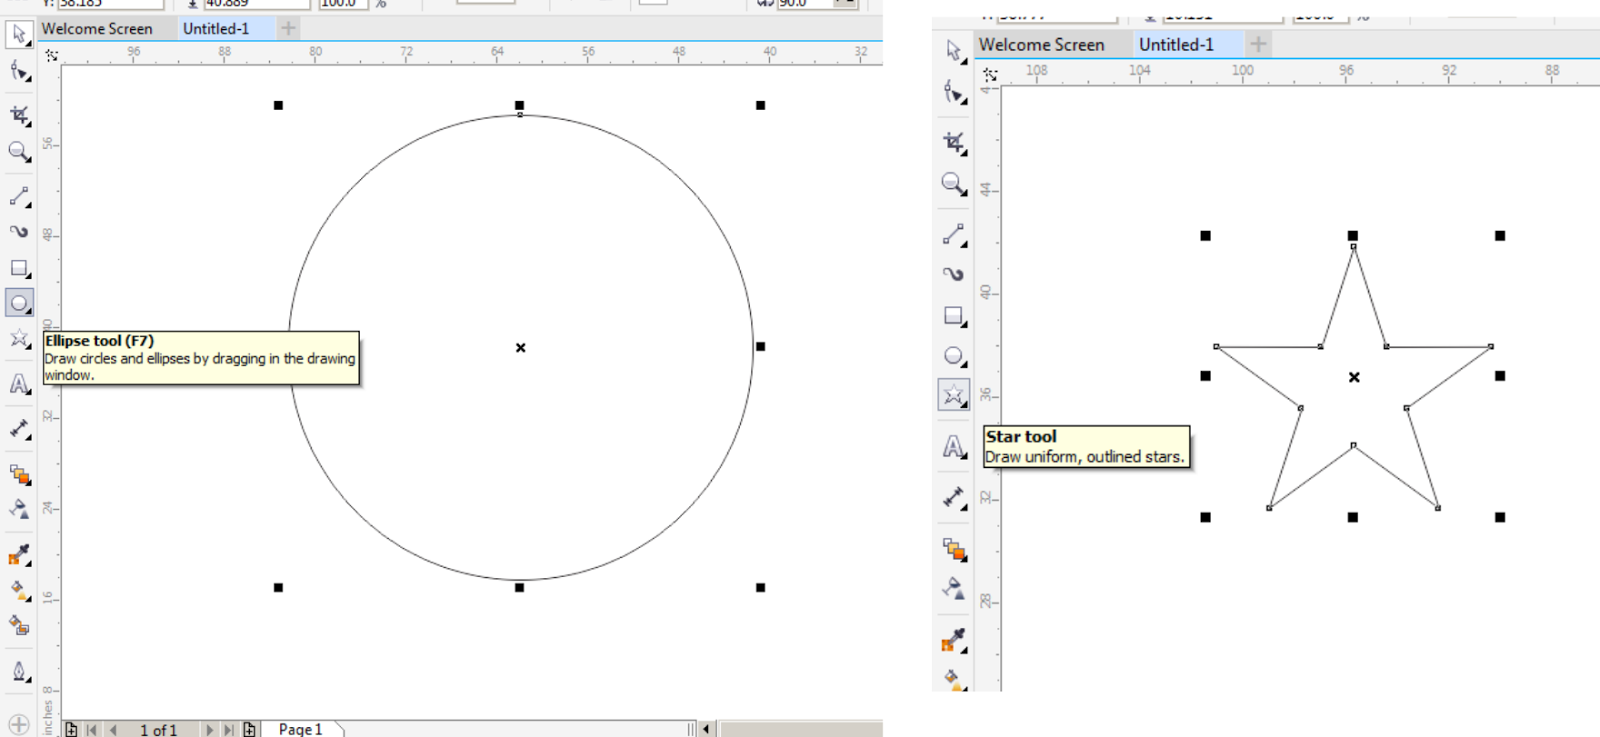 3 buat sebuah lingkaran dan bintang menggunakan Elipse Tool Dan Star Tool Seperti gambar di bawah ini